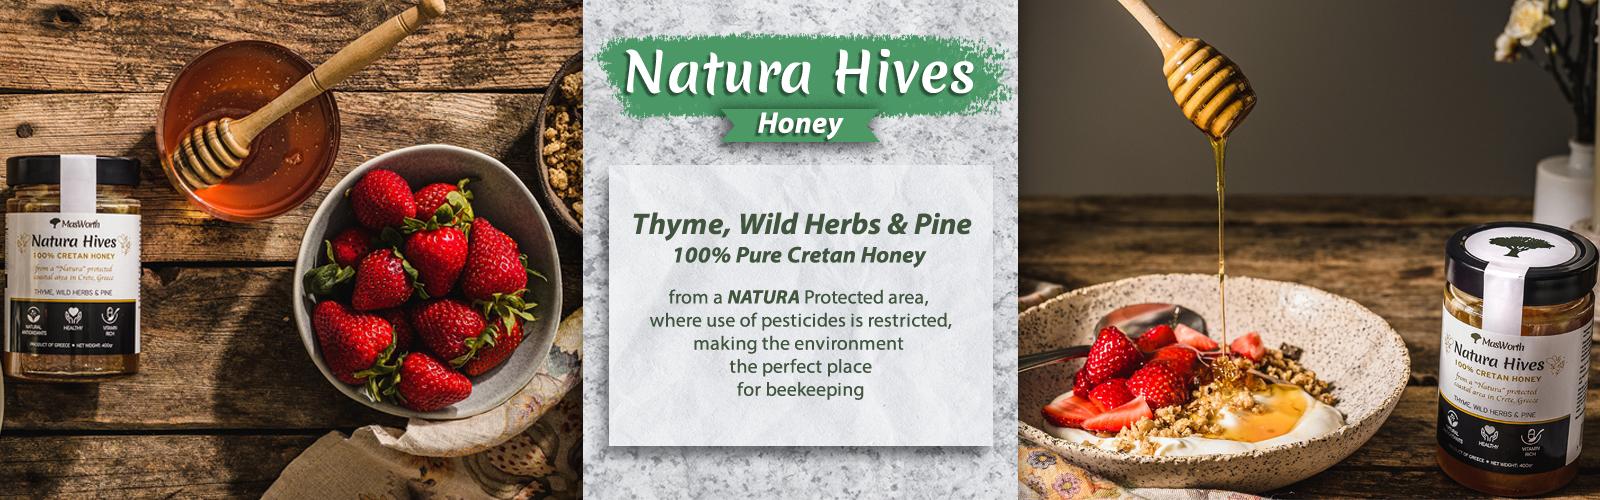 Natura Hives Homepage Banner